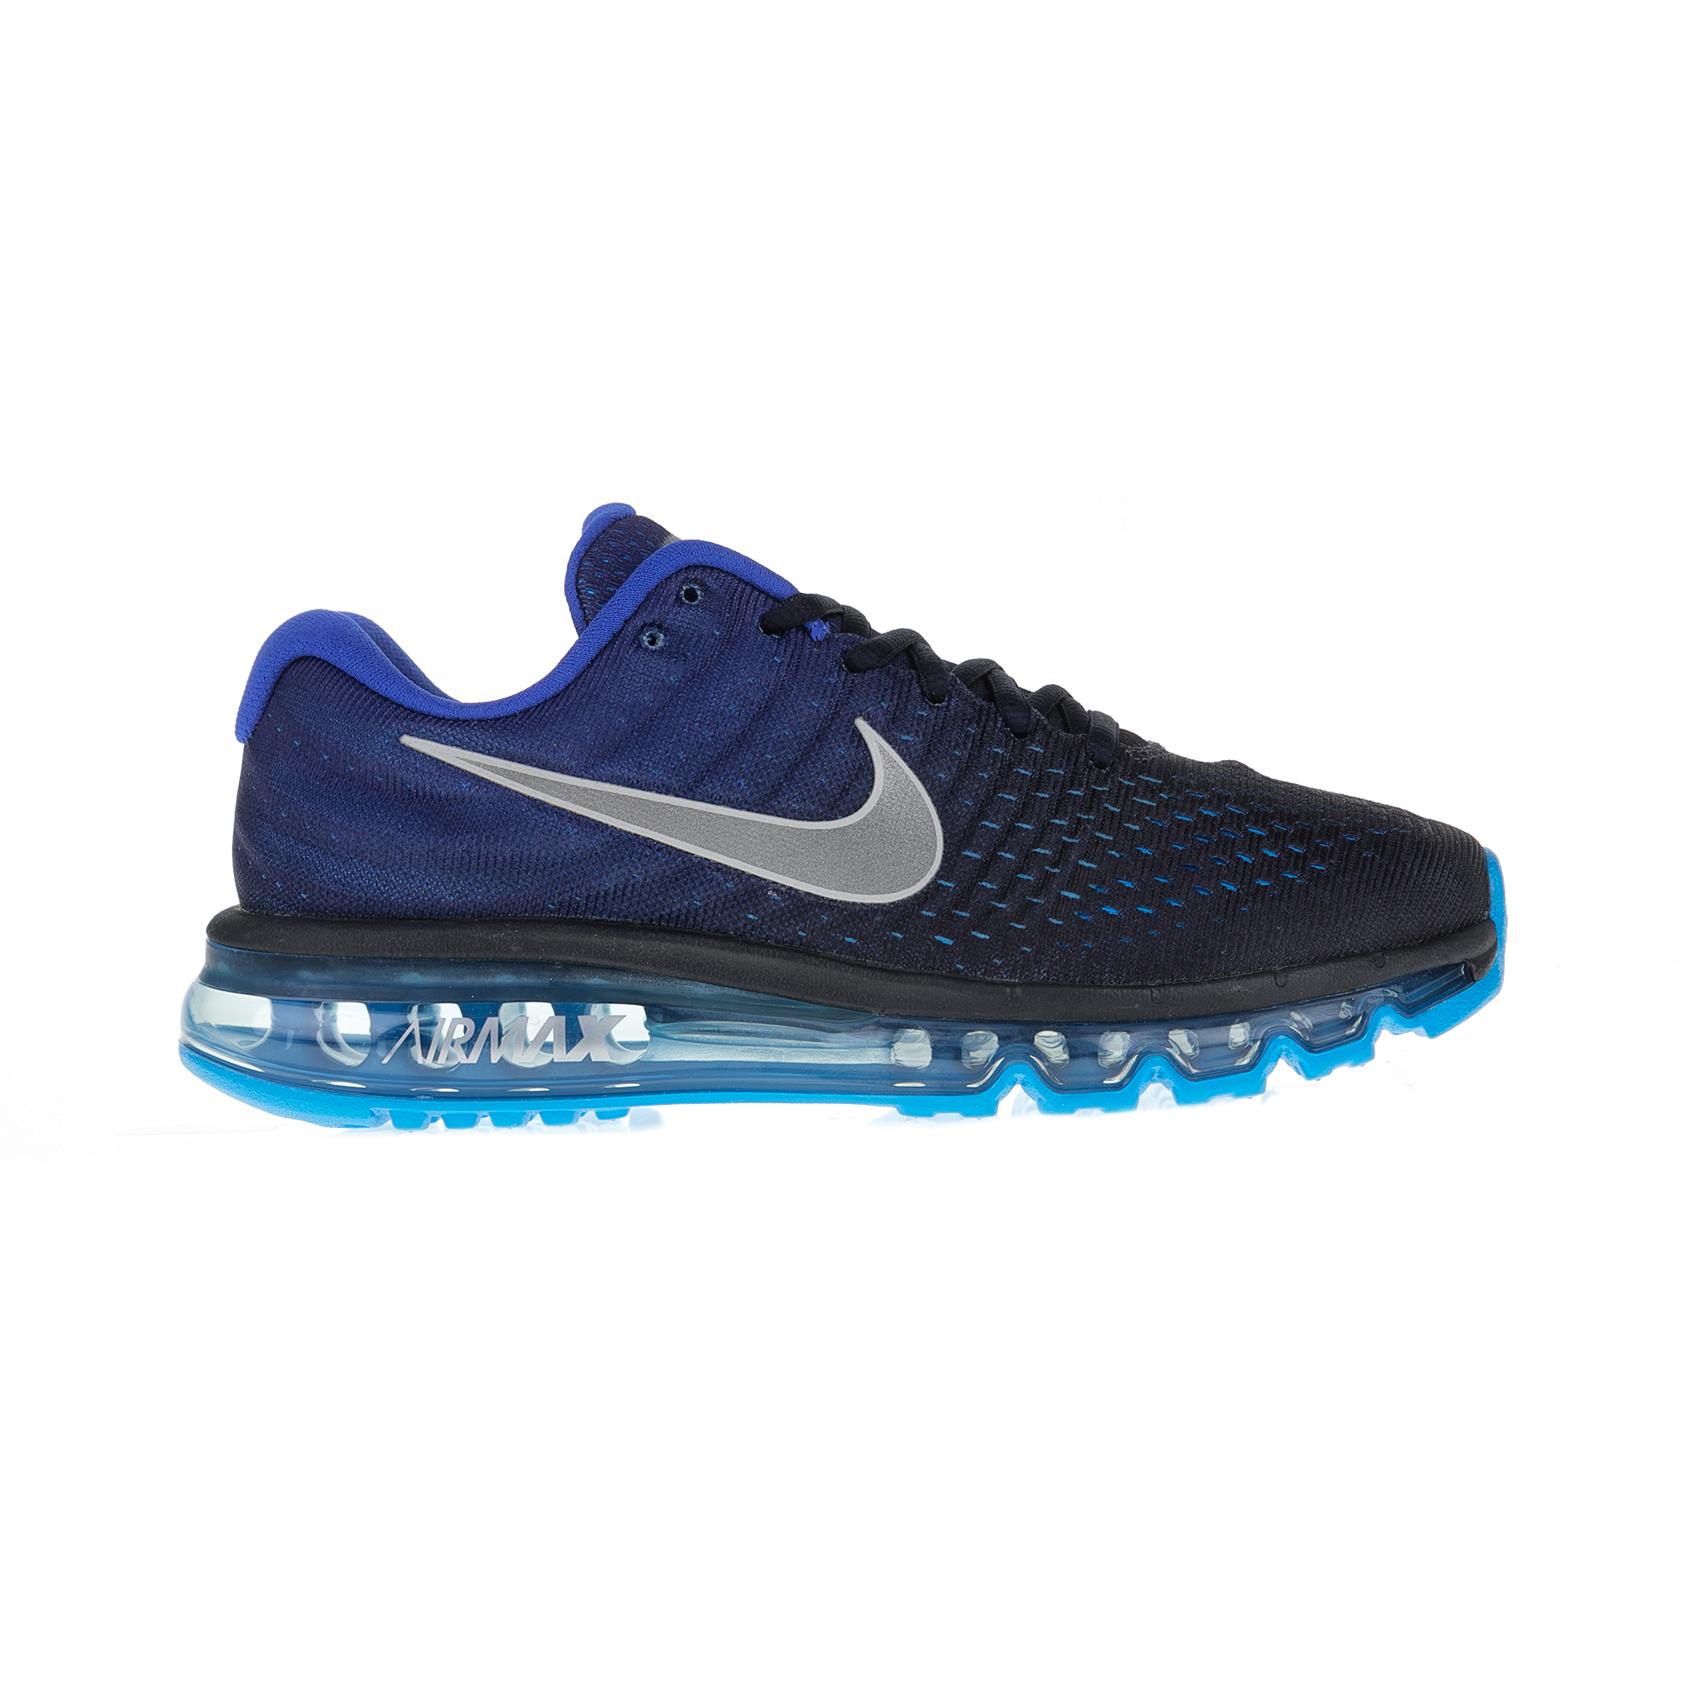 NIKE – Ανδρικά παπούτσια για τρέξιμο Nike AIR MAX 2017 μοβ